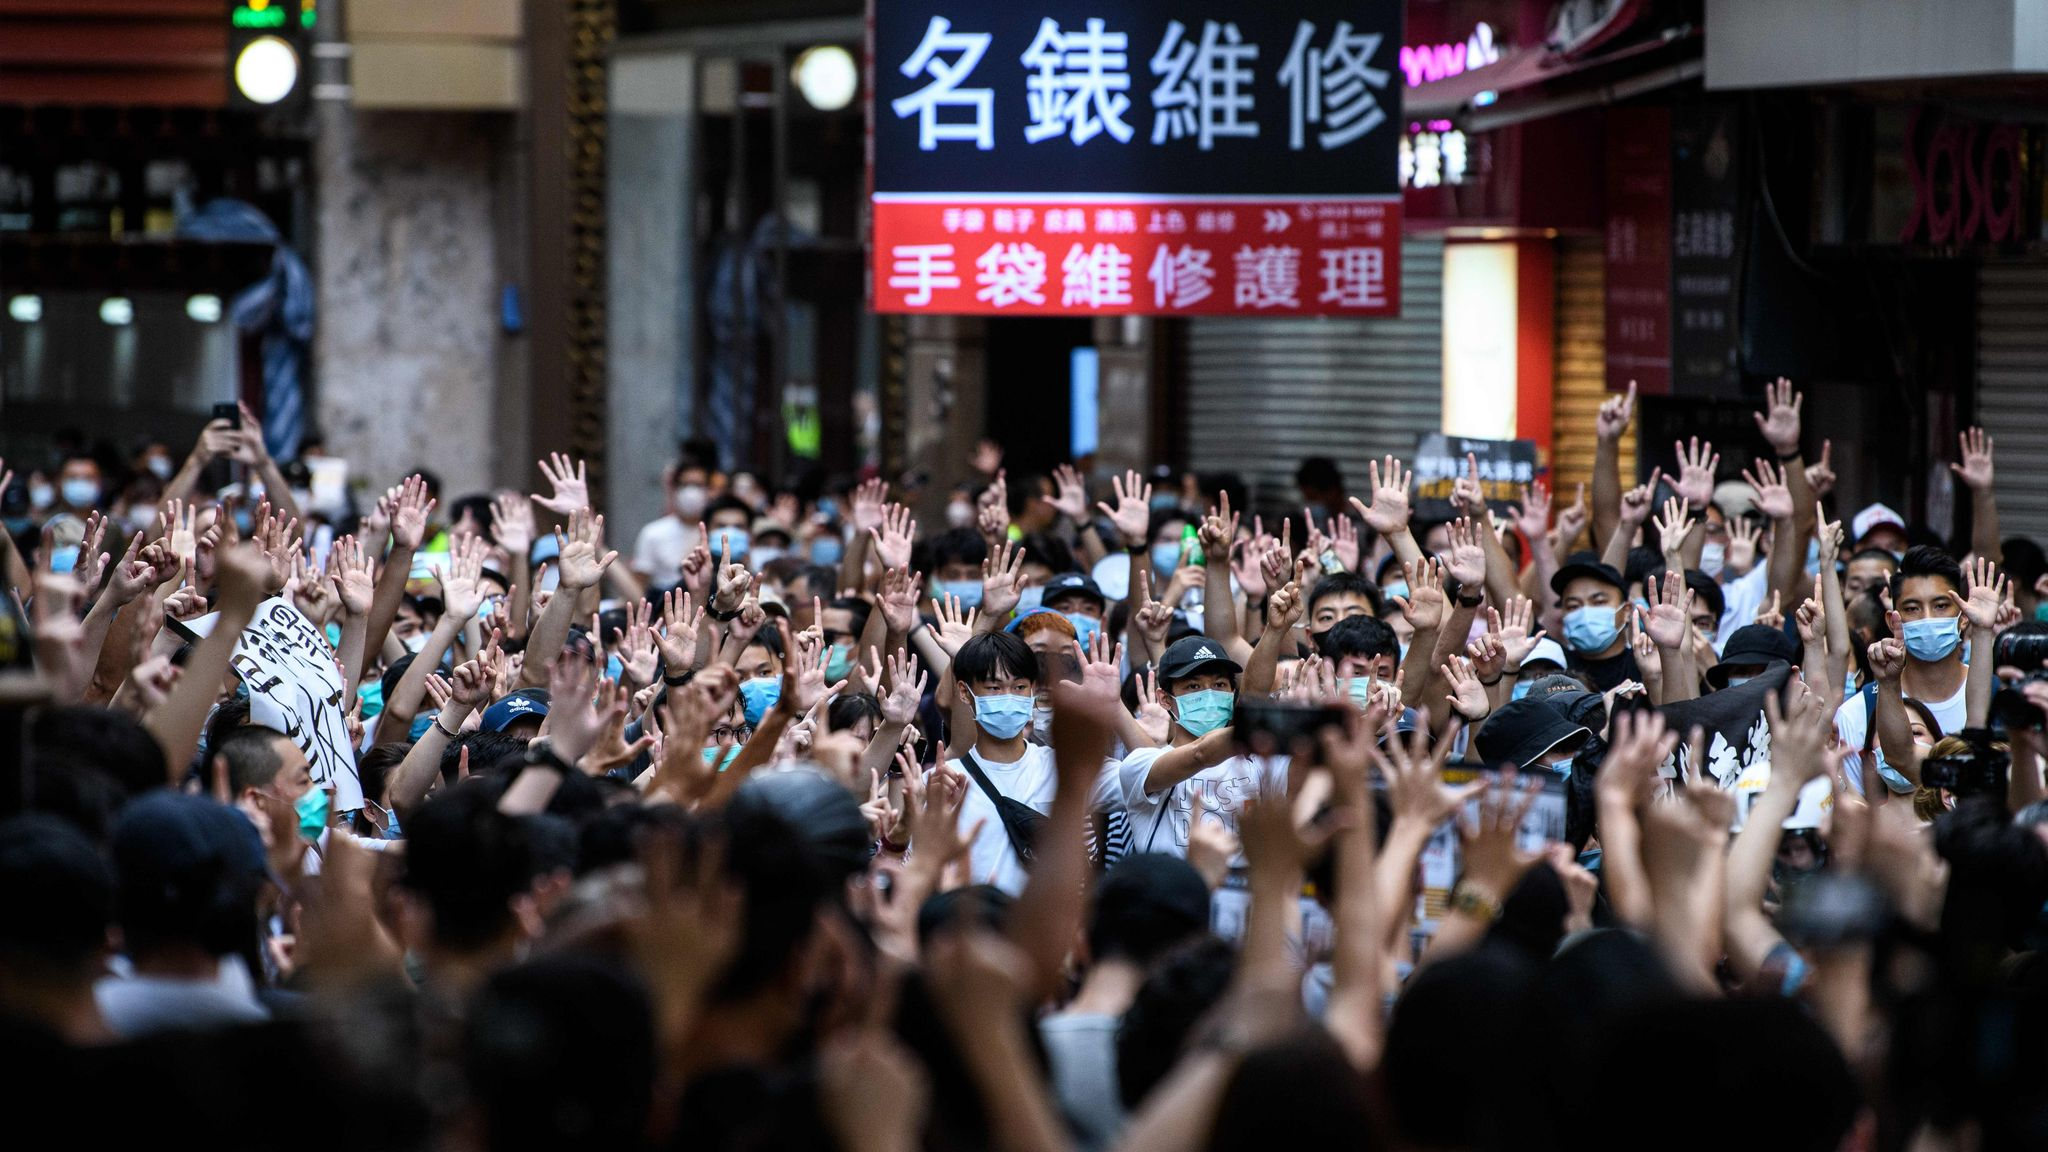 China amenaza a Reino Unido tras promesa de ciudadanía británica a hongkoneses